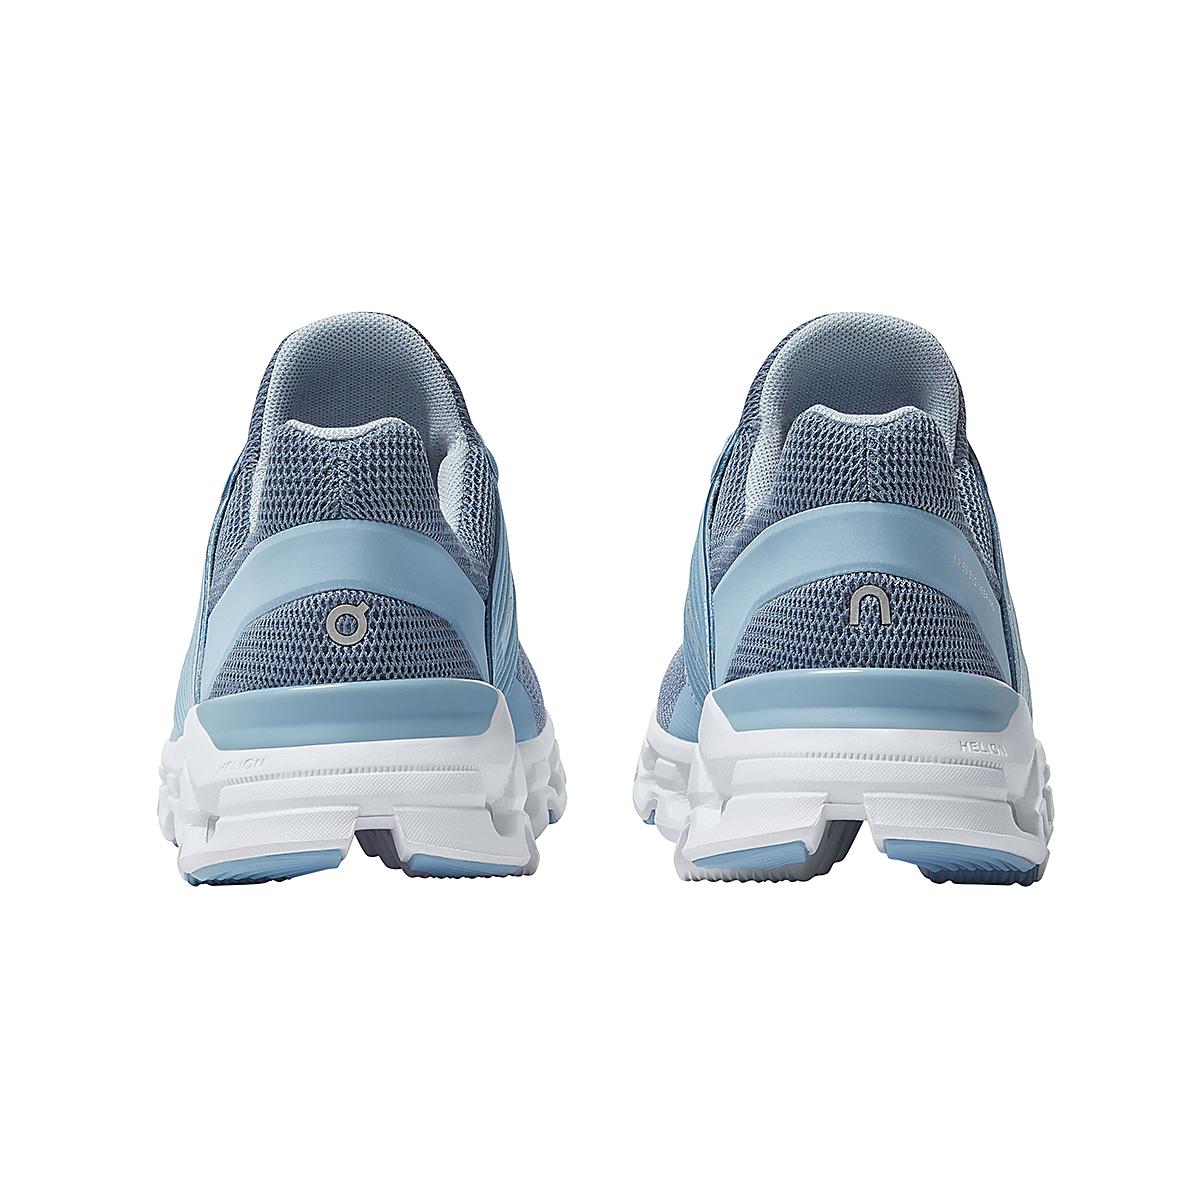 Women's On Cloudswift 2.0 Running Shoe - Color: Lake/Sky - Size: 5 - Width: Regular, Lake/Sky, large, image 5